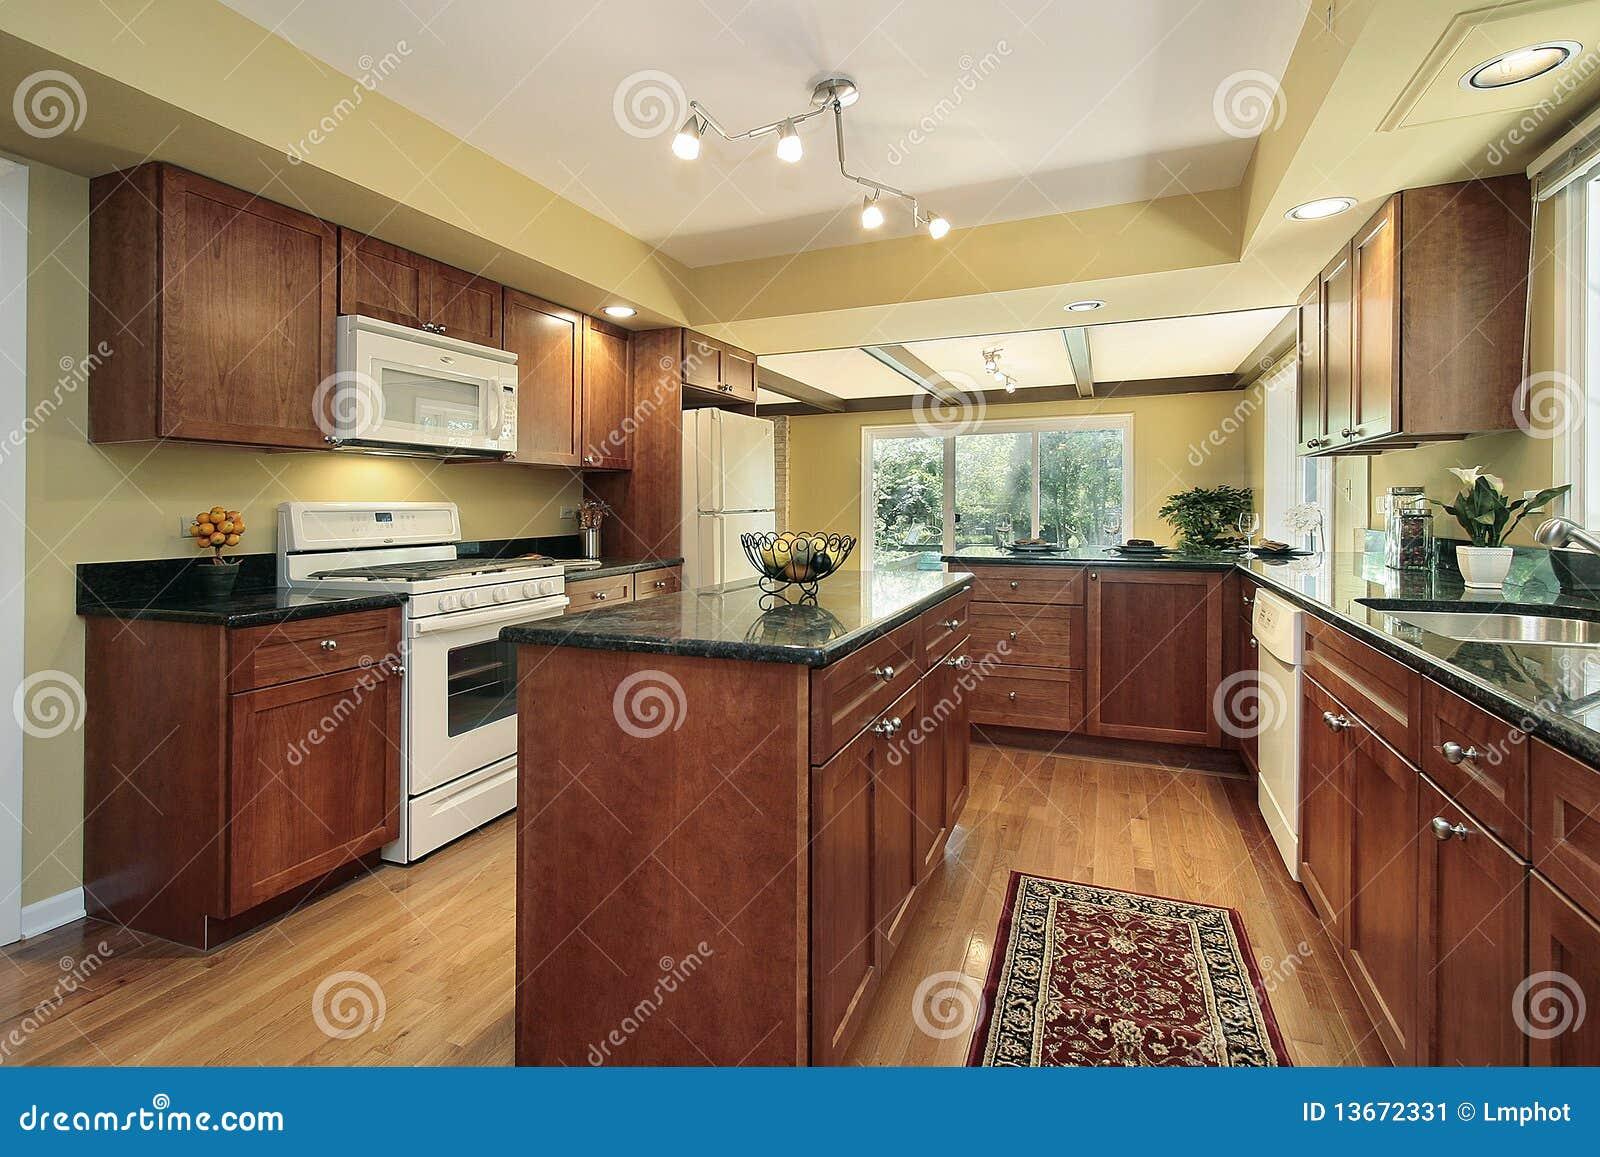 Comblack Granite Kitchen : Kitchen With Black Granite Counters Stock Image - Image: 13672331